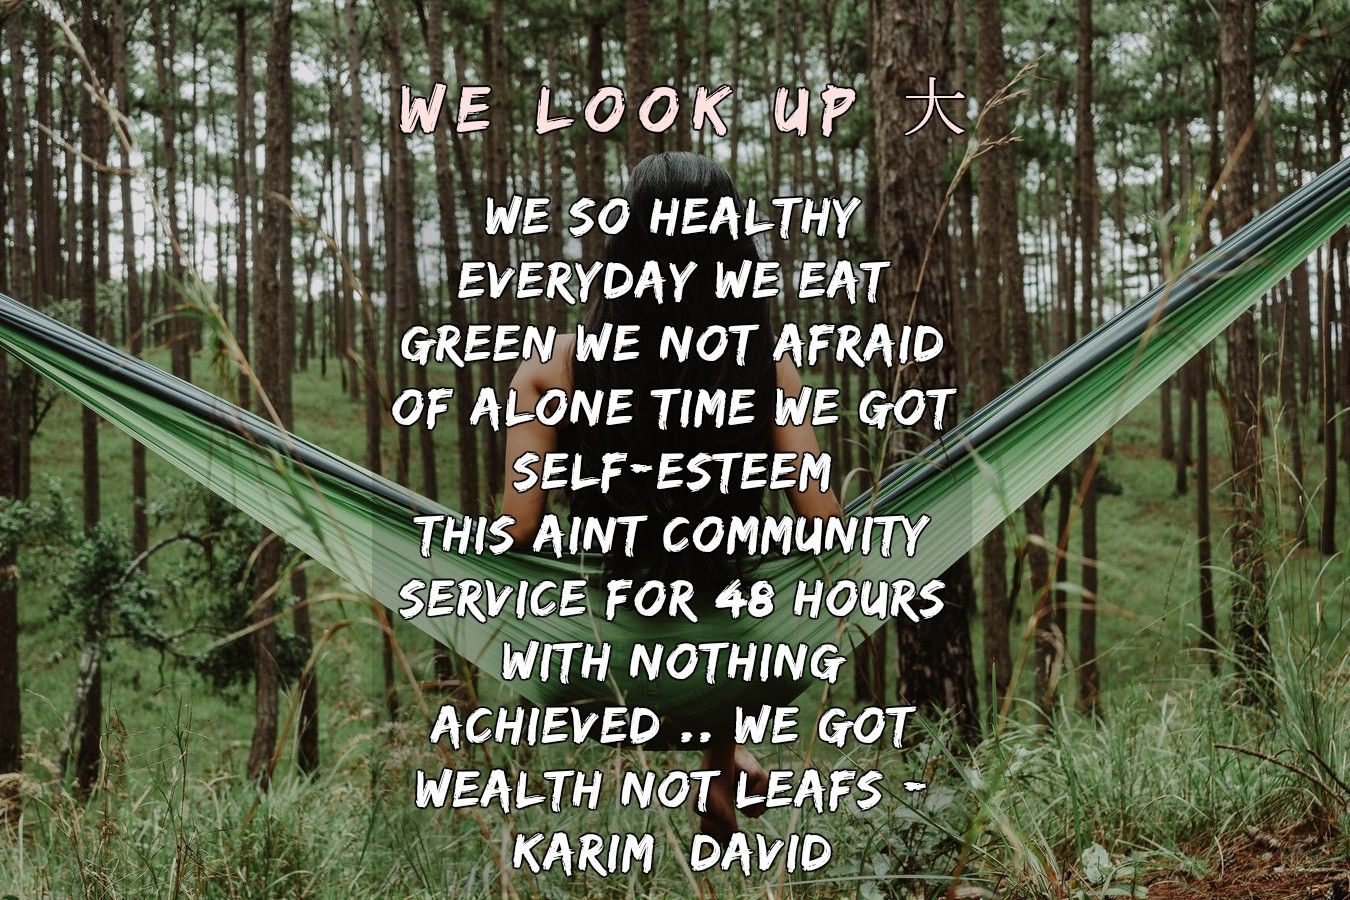 Health is wealth 𝐖𝐞 𝐋𝐨𝐨𝐤 𝐔𝐩 大 health looking up wealth